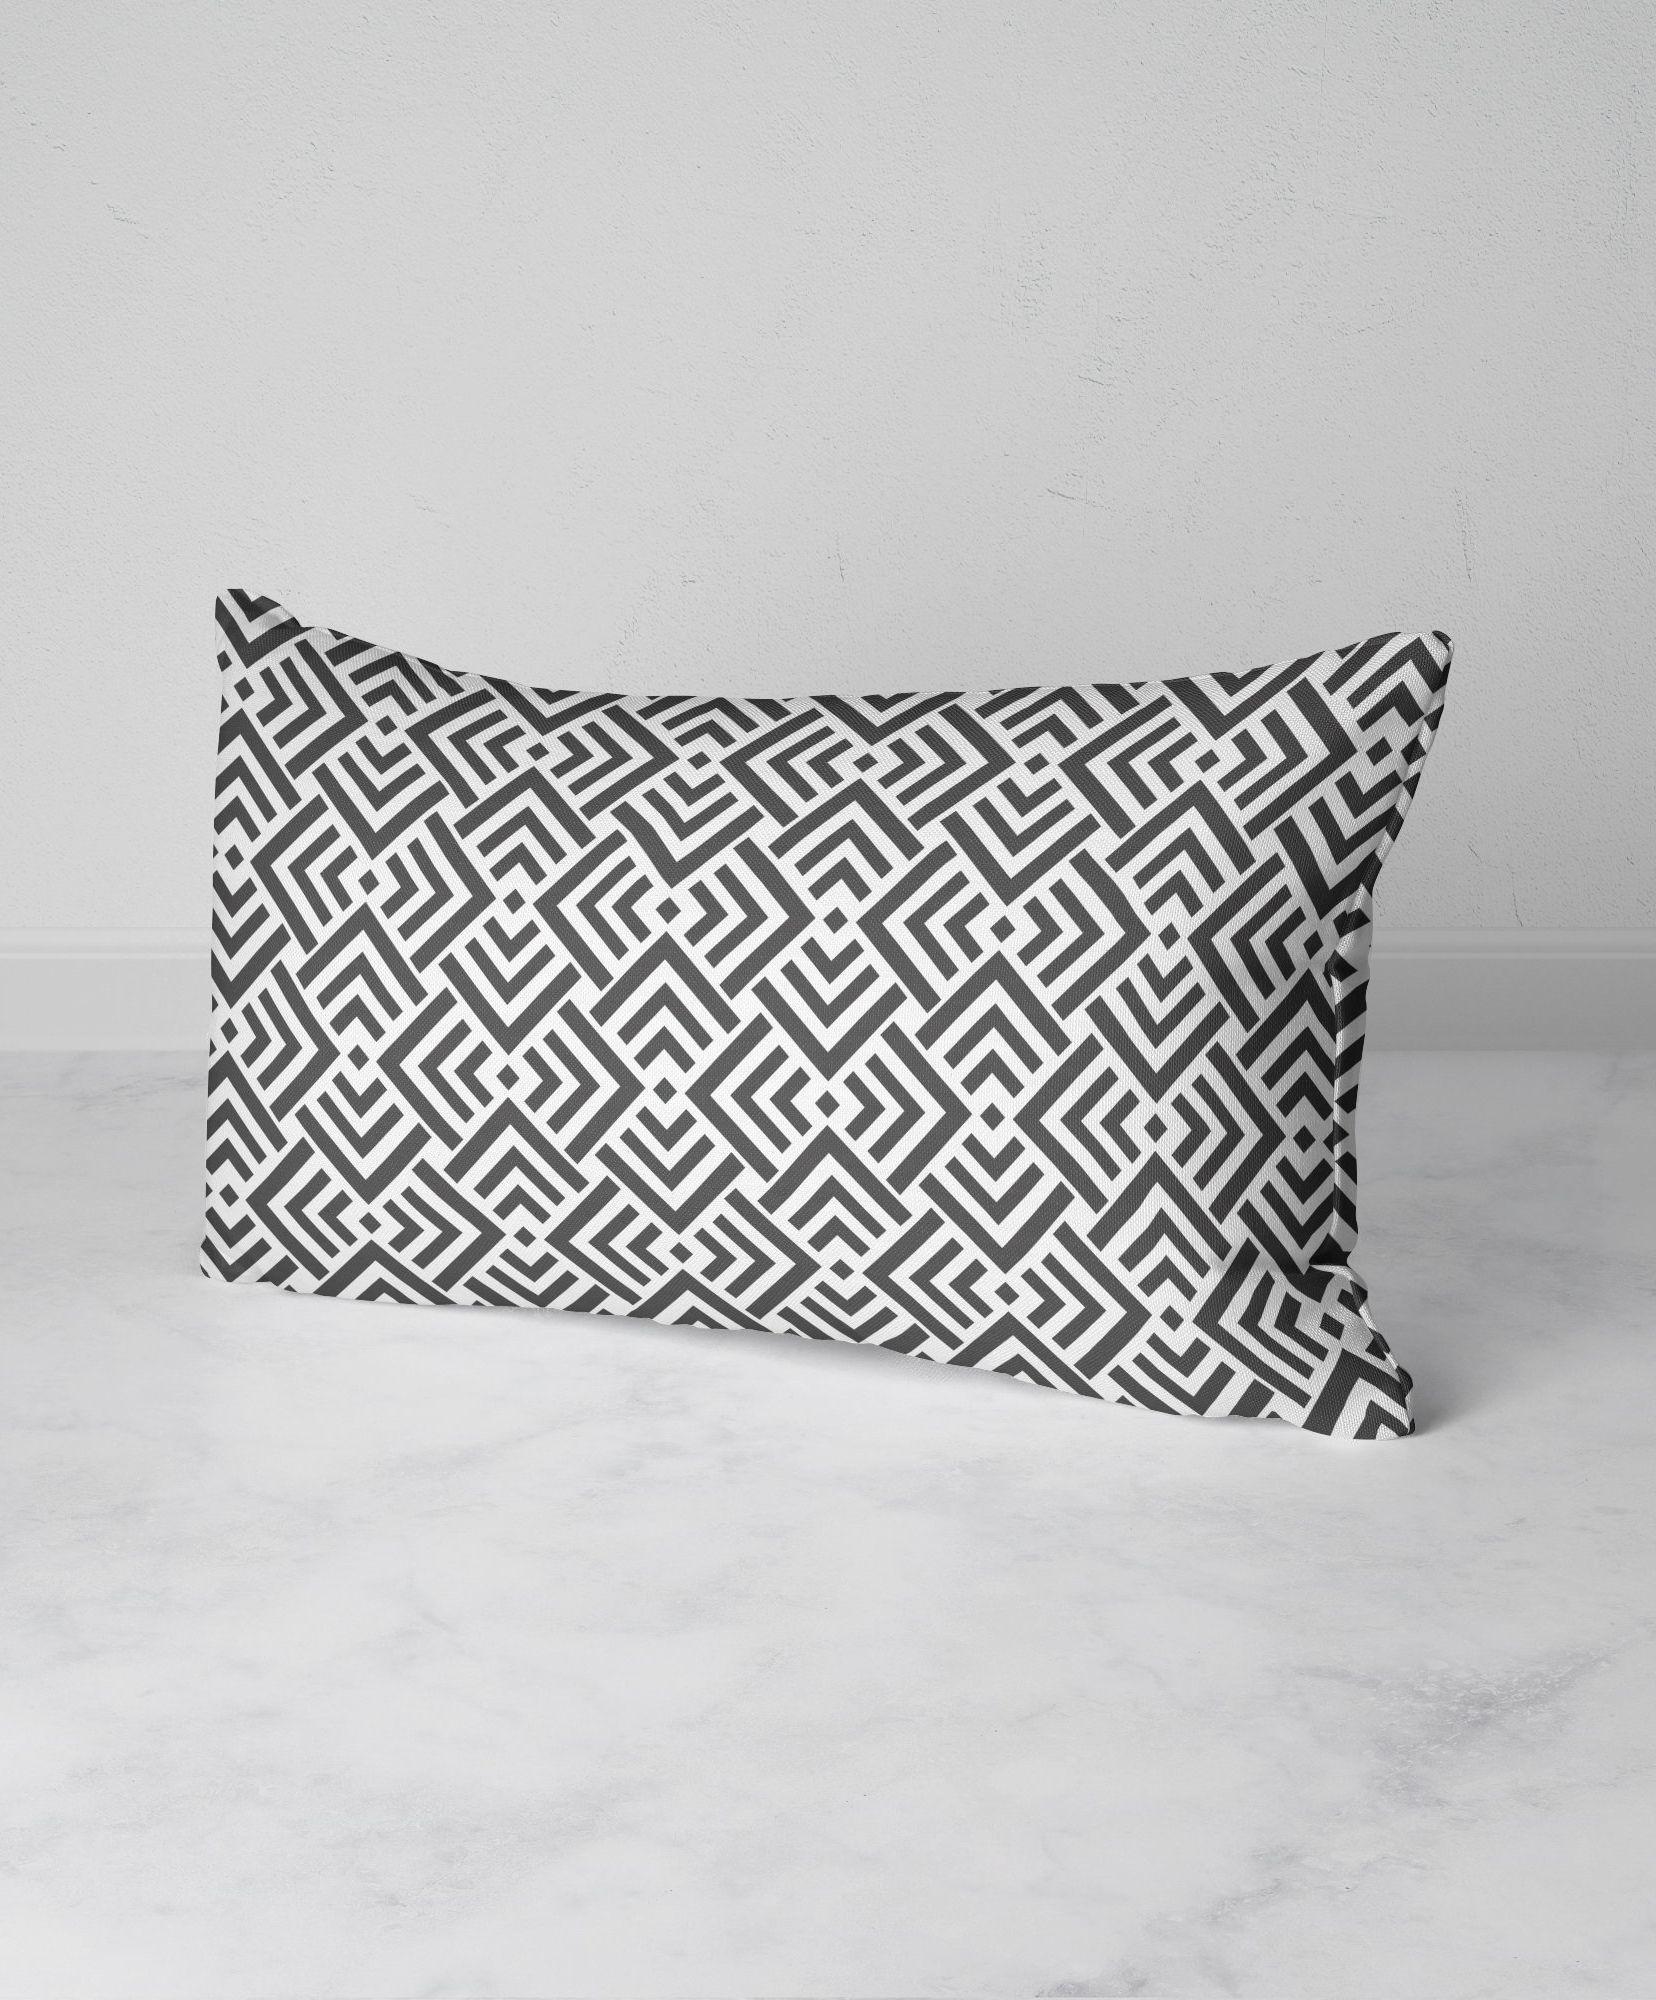 Gray Geometric Throw Pillow Rectangle Lumbar Pillow Triangle Pattern Accent Pillow 12x20 Faux Geometric Throw Pillows Throw Pillows Decorative Throw Pillows